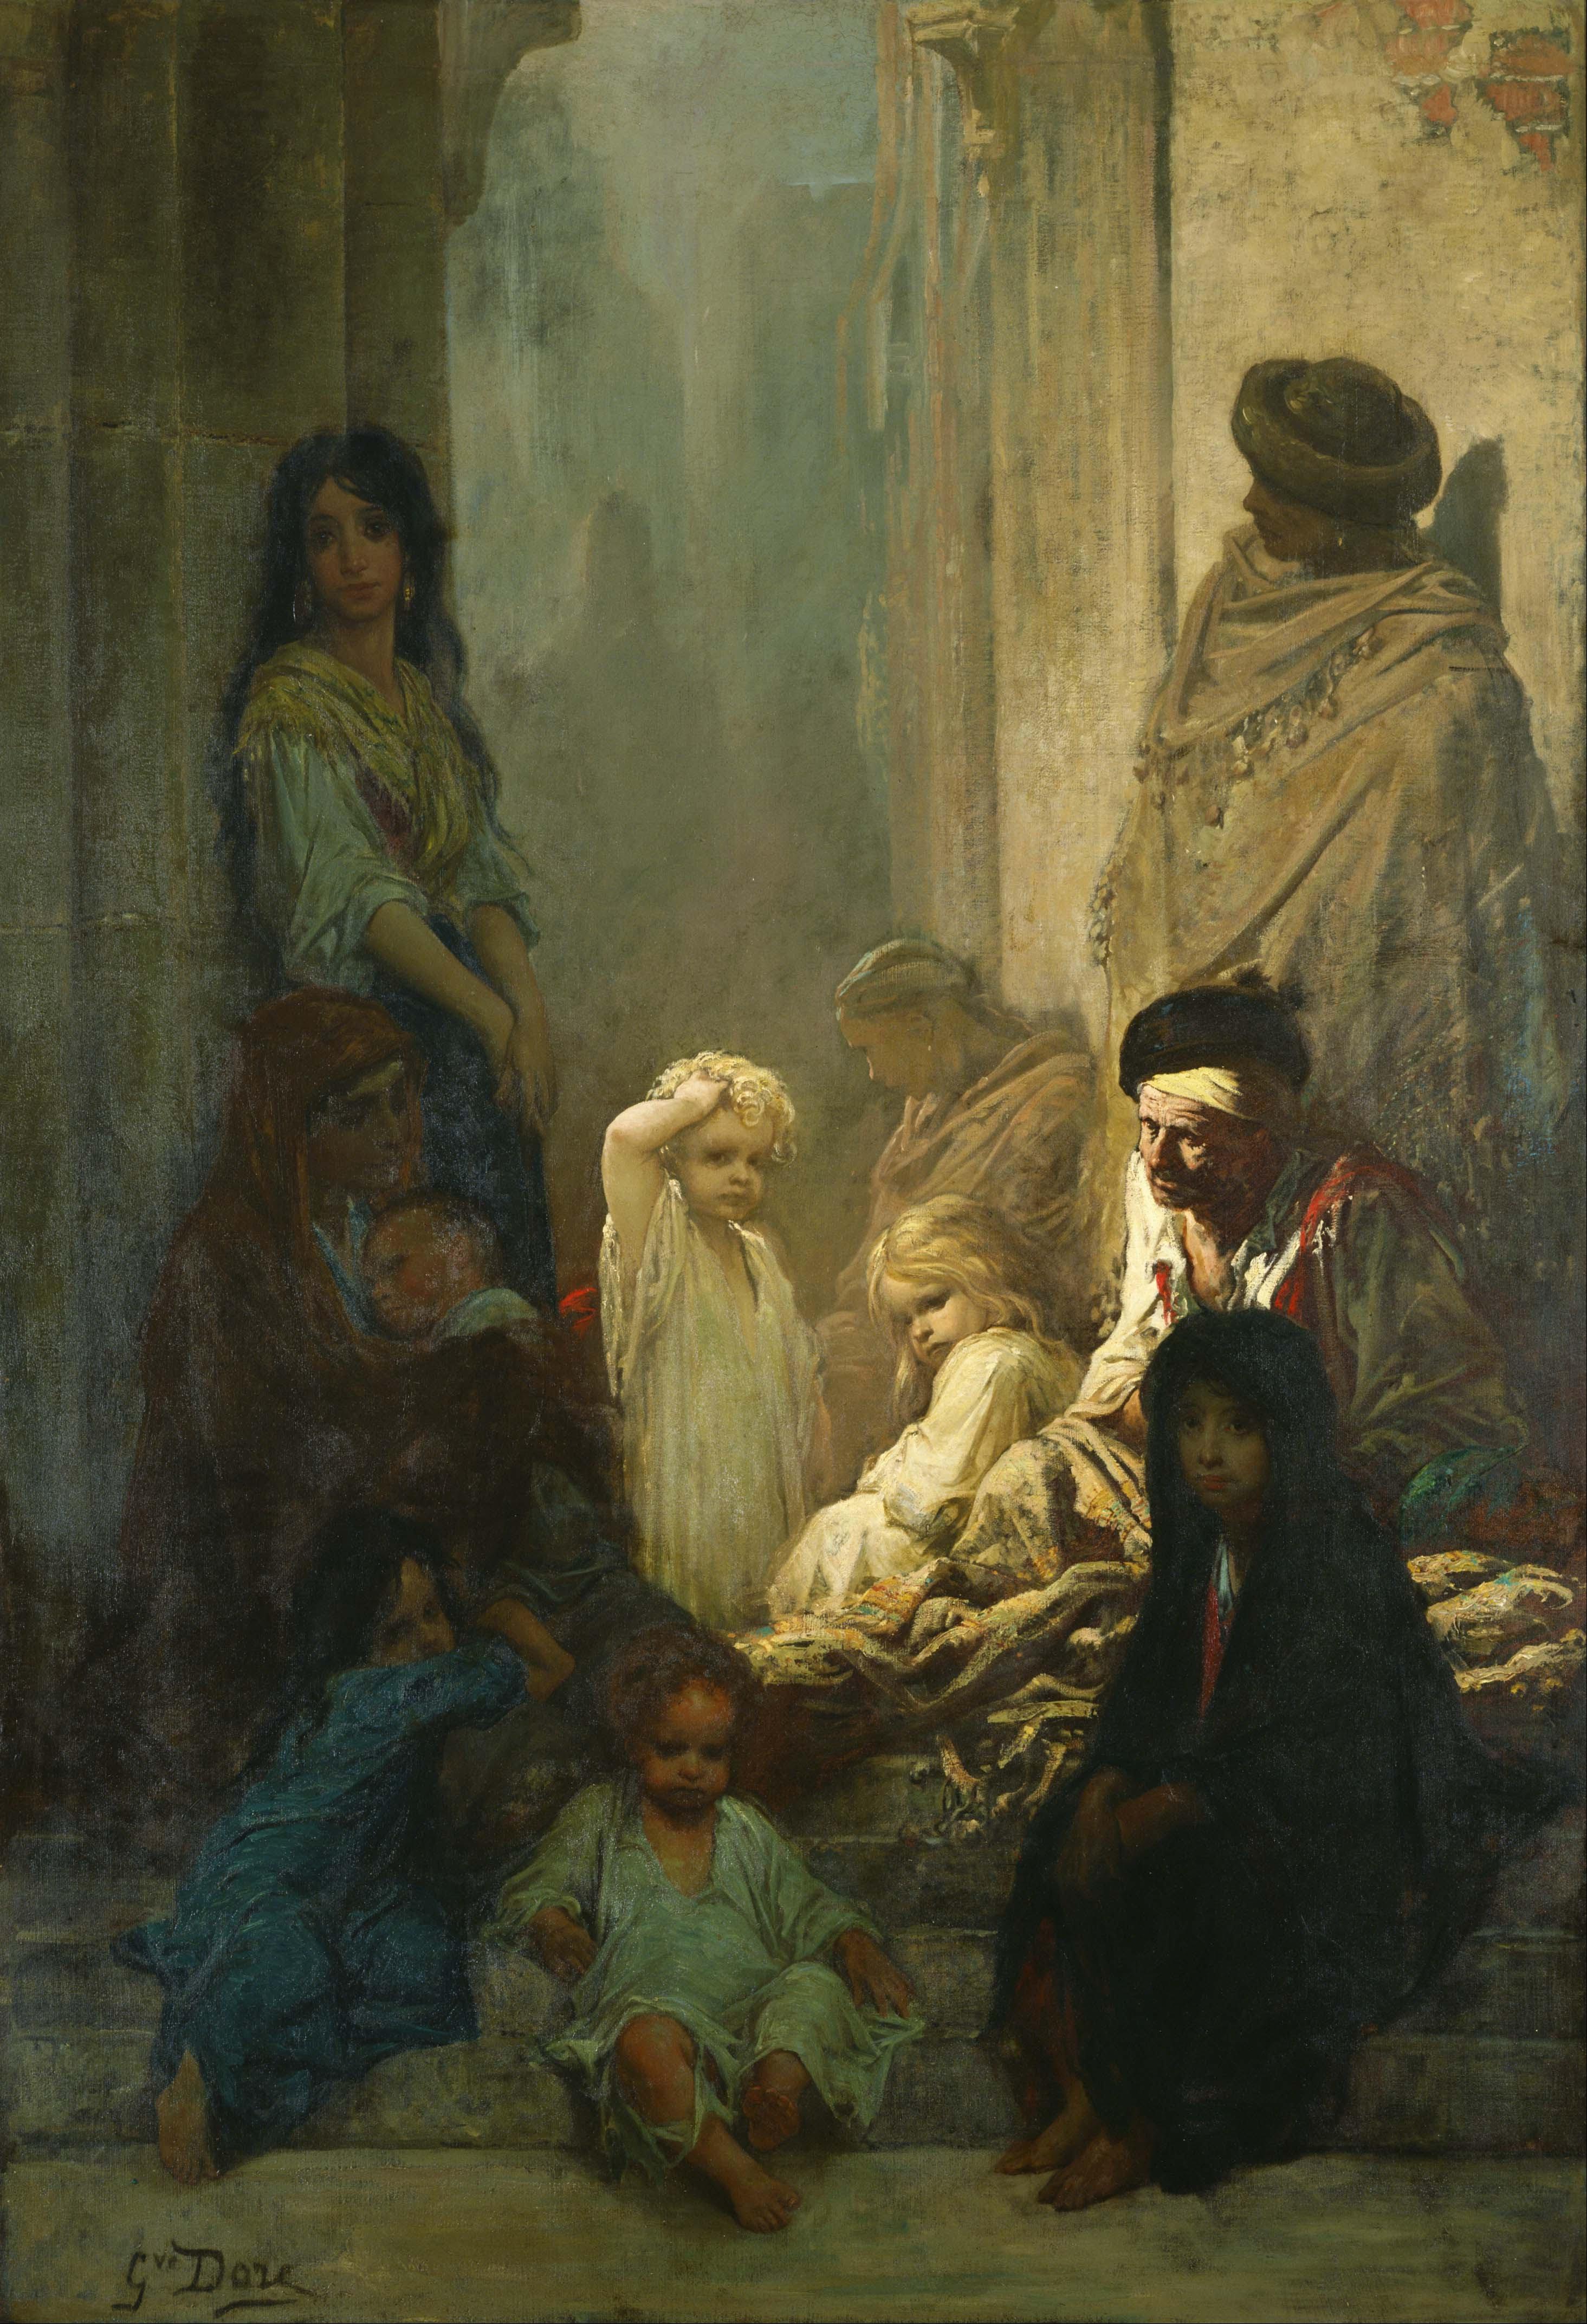 Gustave Dore - La Siesta, Memory of Spain - Google Art Project.jpg